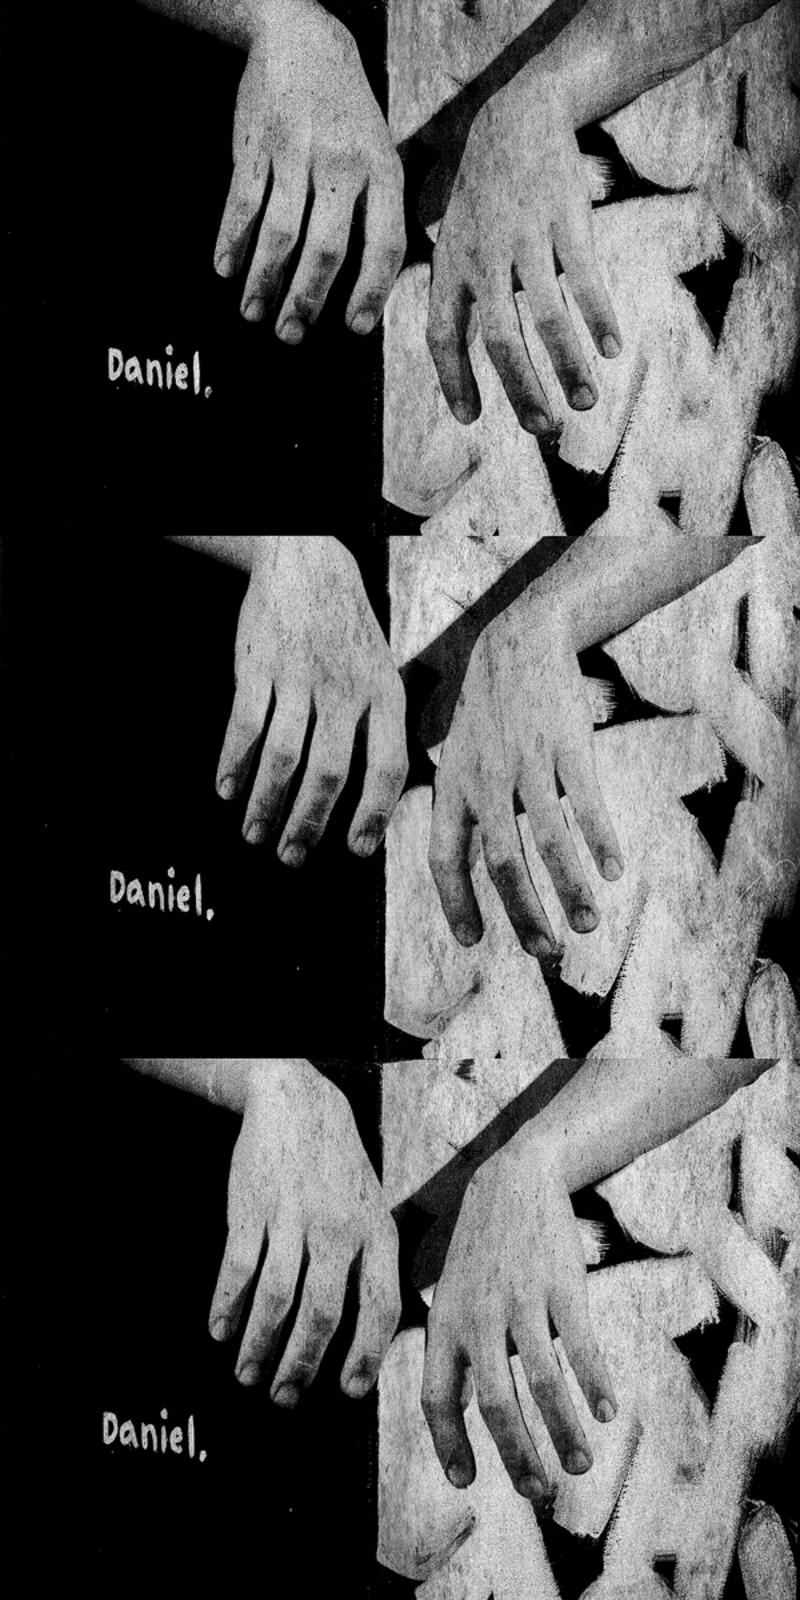 Daniel, Daniel, Daniel, 2016